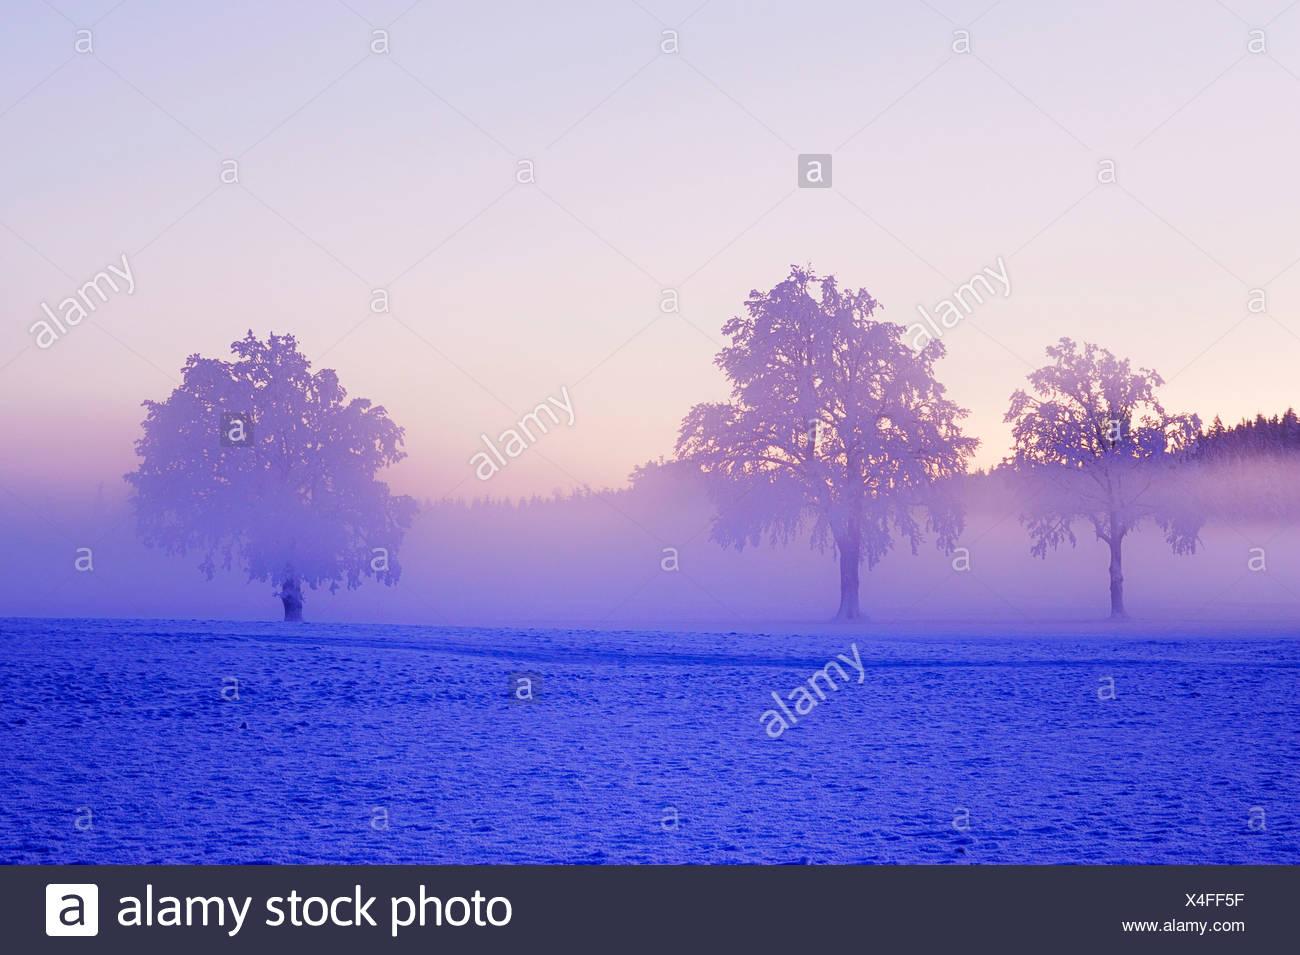 Winter landscape shrouded in fog, Horben, Aargau, Switzerland, Europe - Stock Image